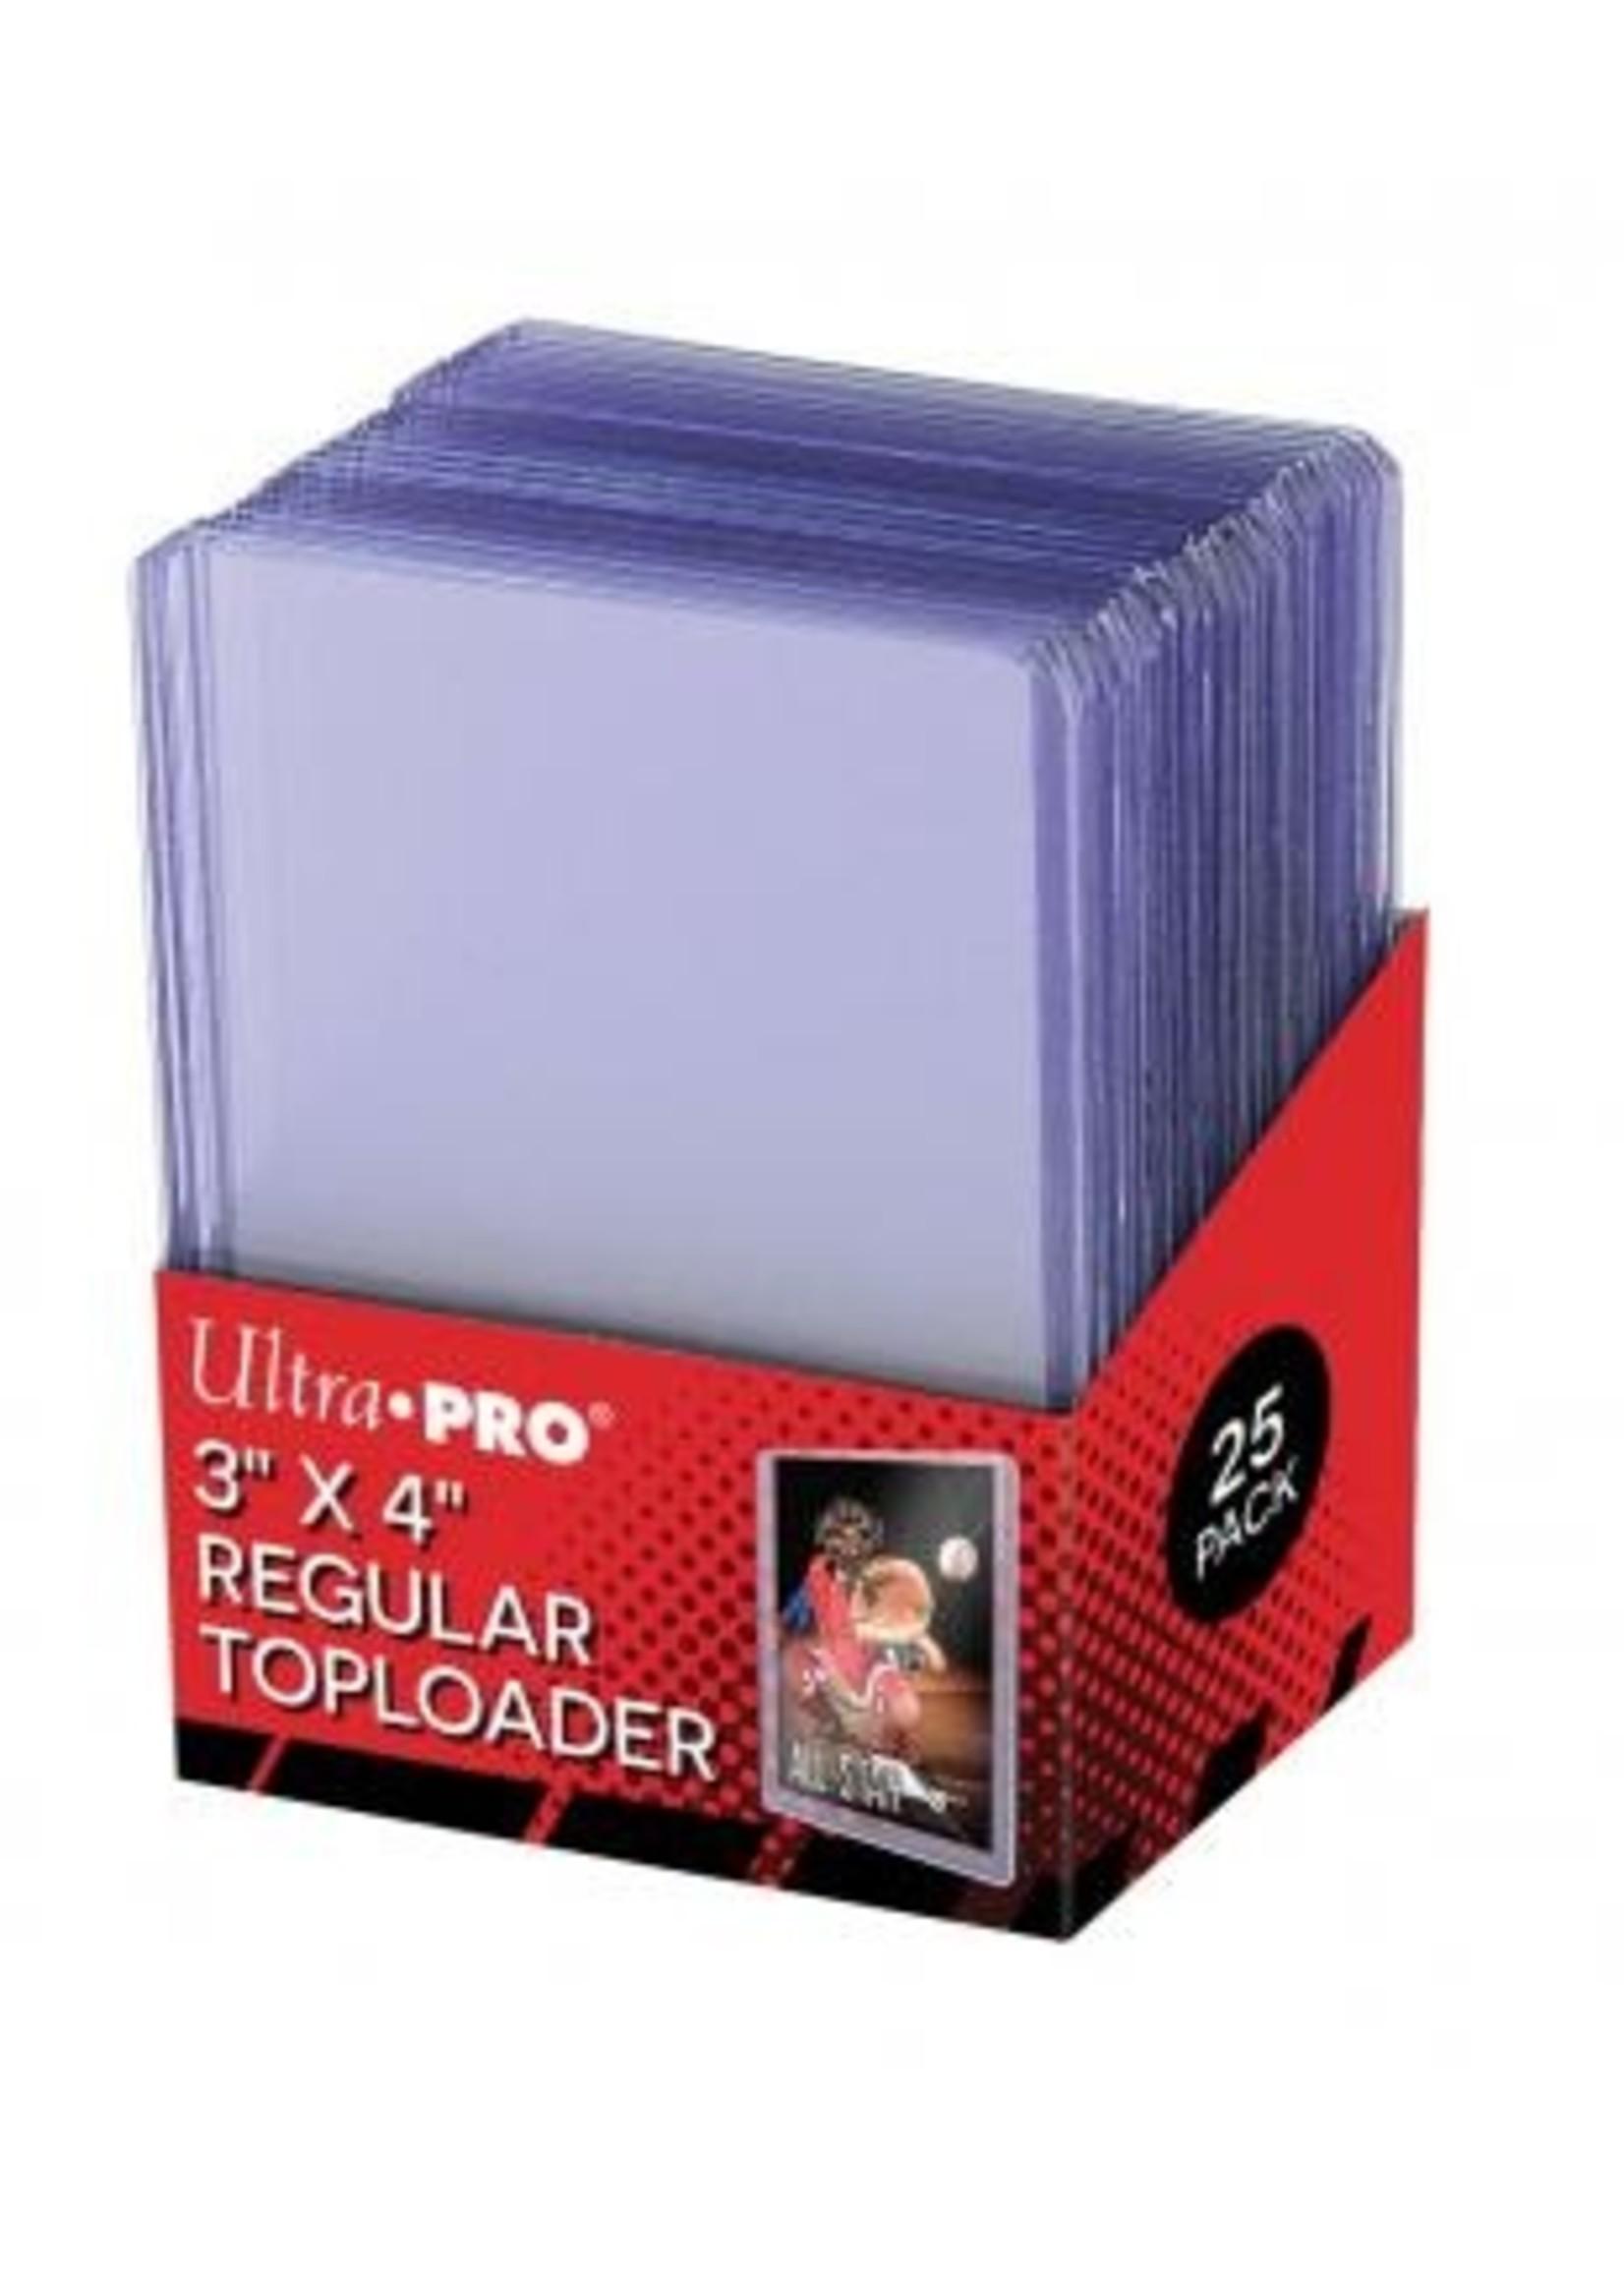 Ultra Pro Regular Toploader 25ct